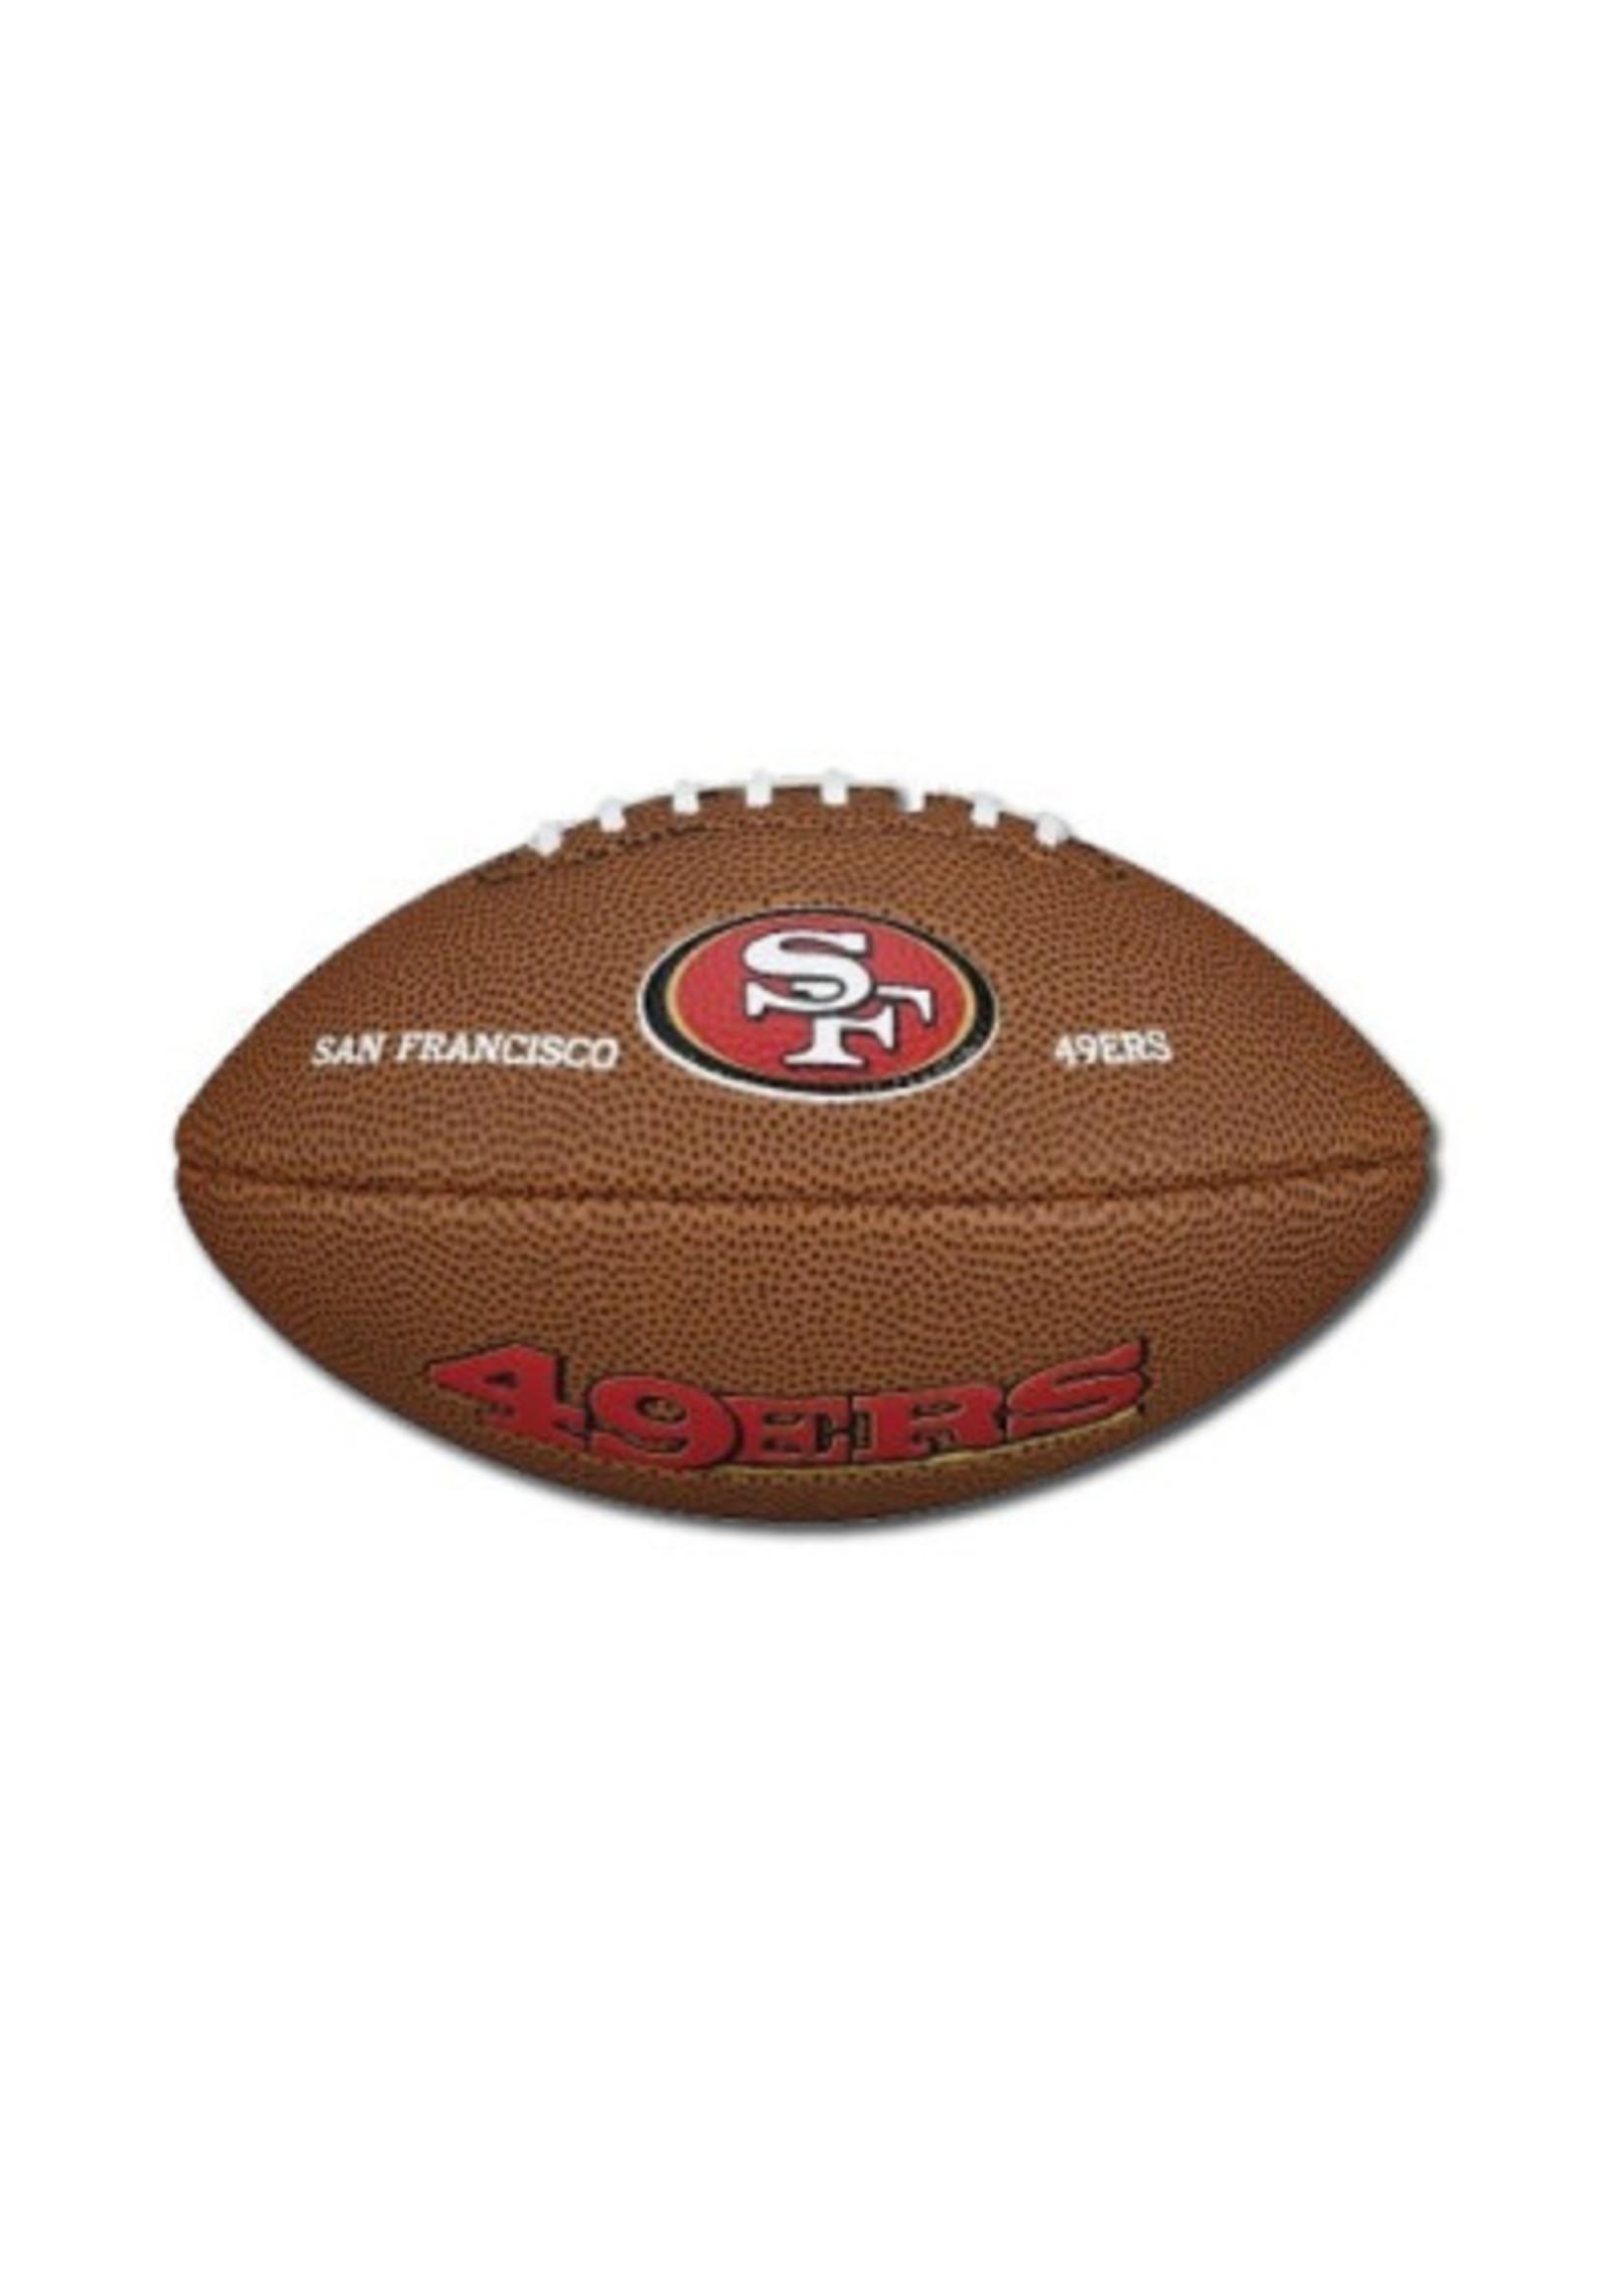 WILSON WILSON BALLON FOOTBALL NFL MINI TEAM LOGO FB SF